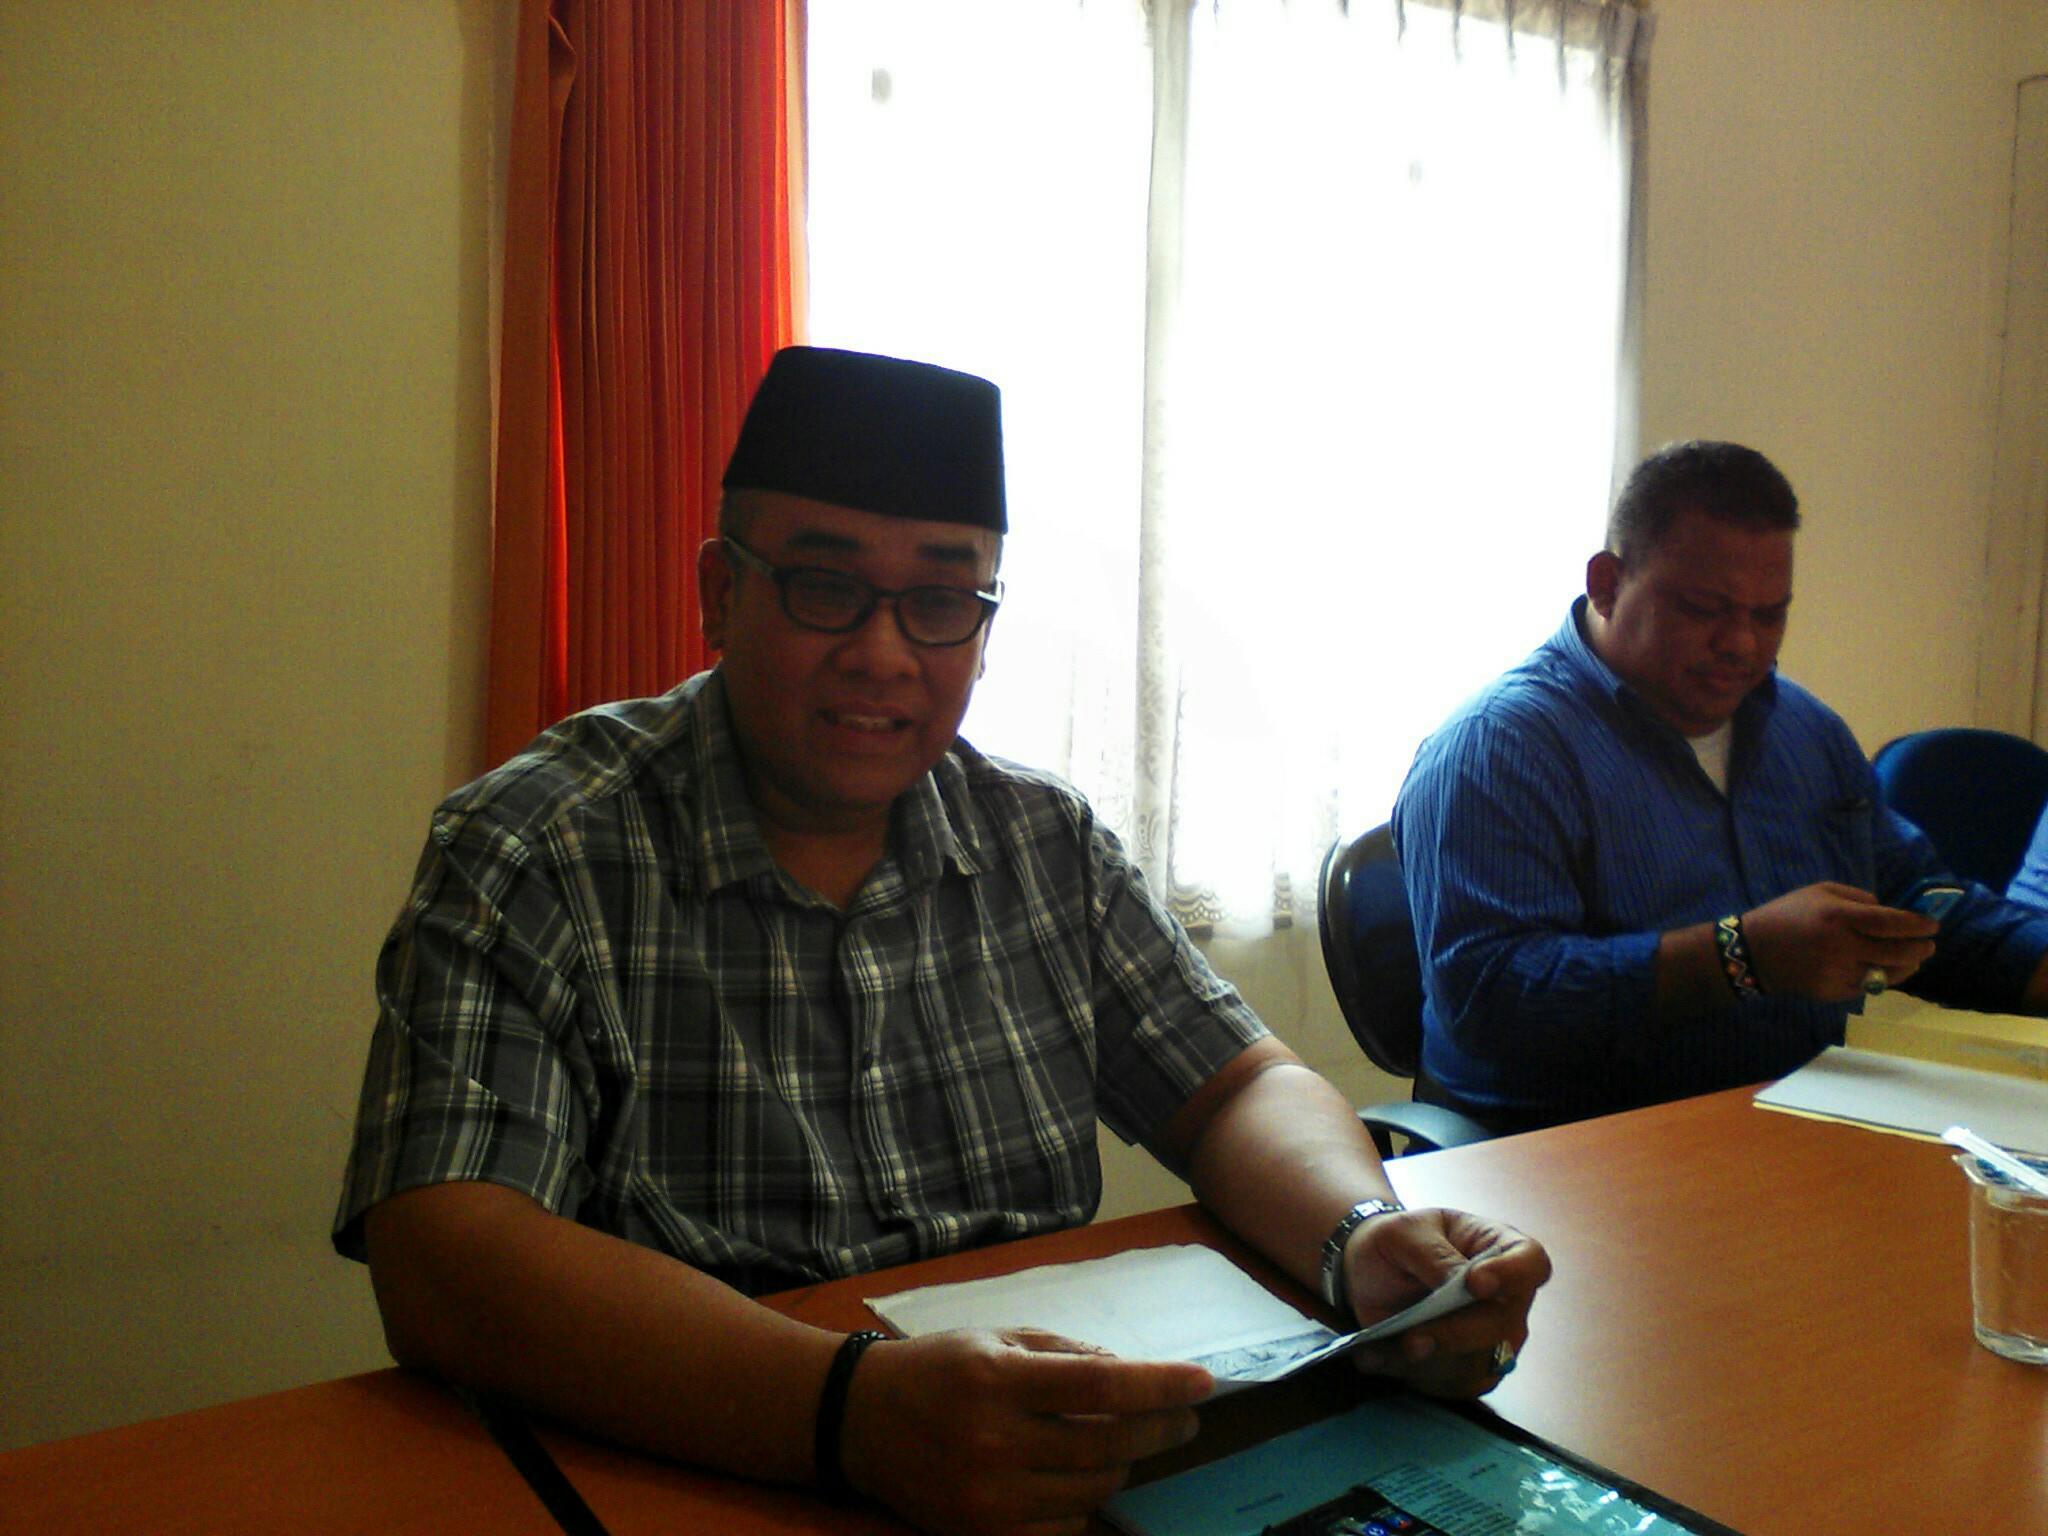 Perwakilan Anggota Dewan Perwakilan Daerah (DPD) RI asal Provinsi Lampung, Andi Surya. | Robby/Jejamo.com